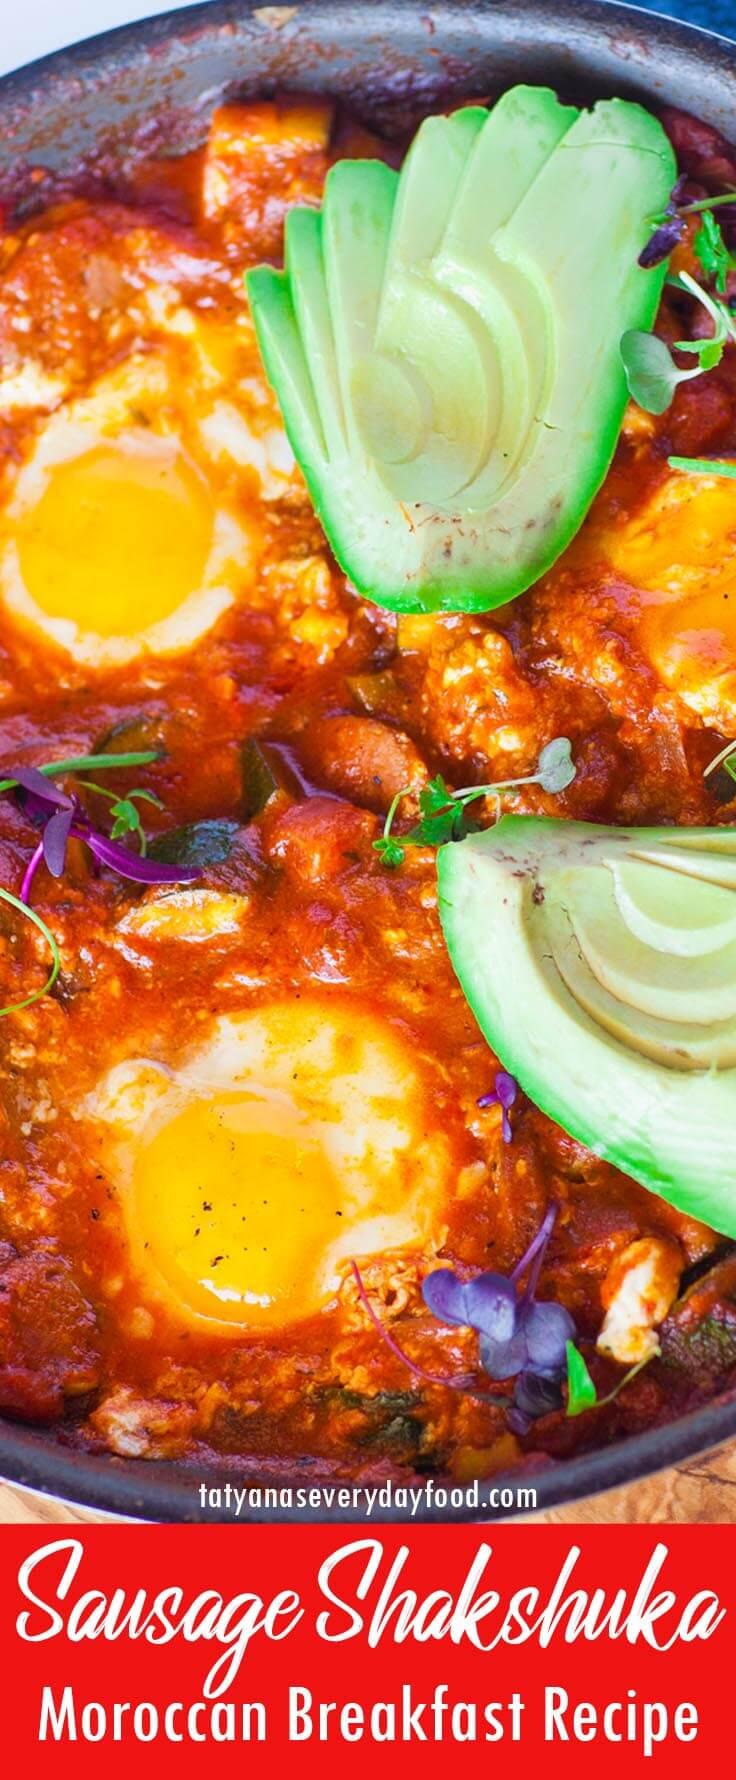 Veggie & Sausage Shakshuka video recipe